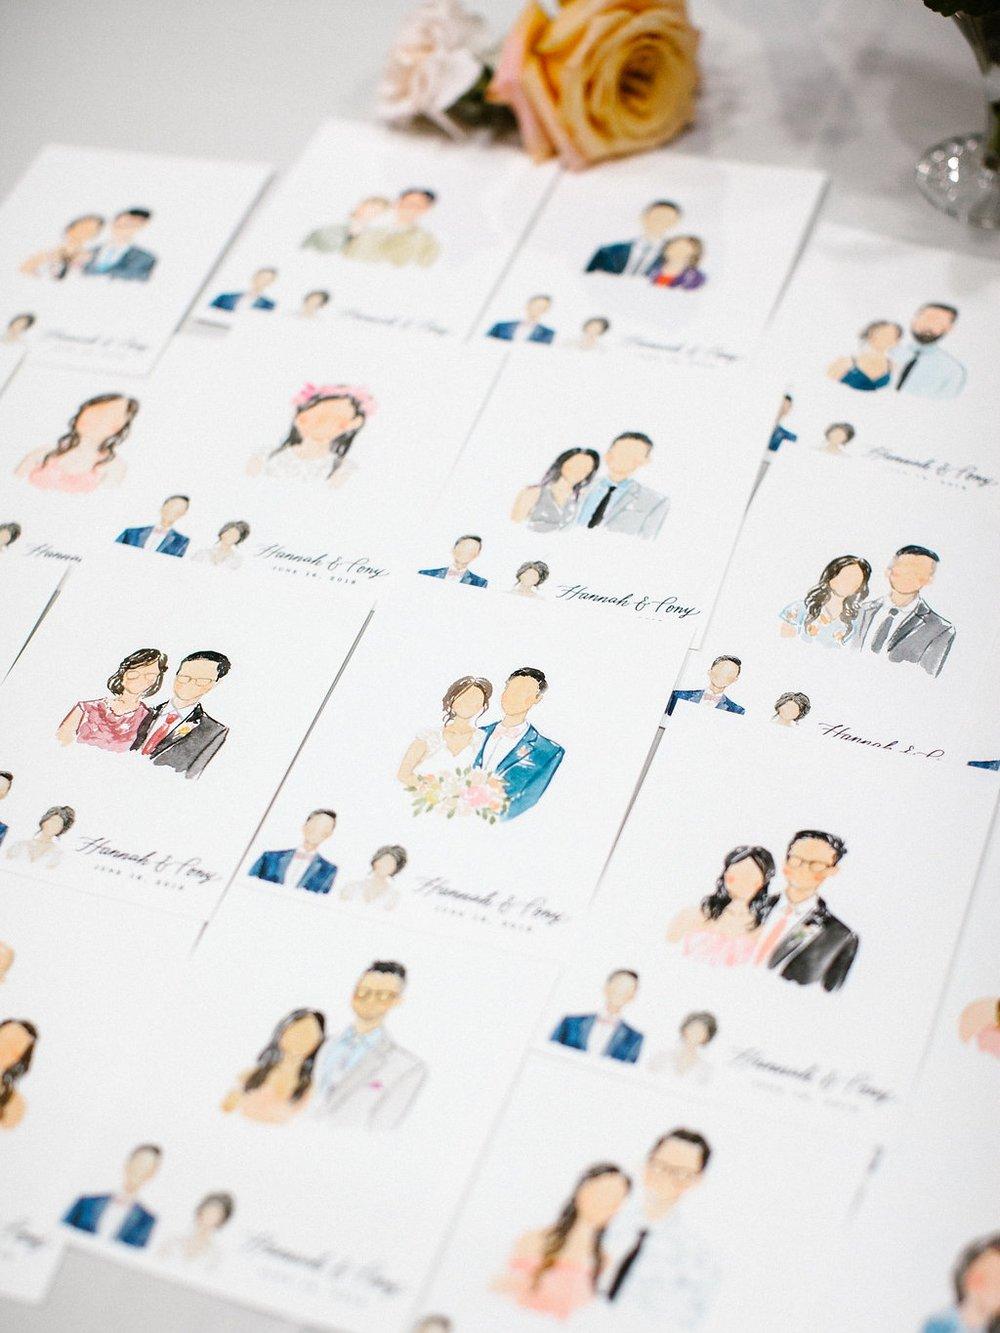 live+art+watercolor+portrait+at+wedding